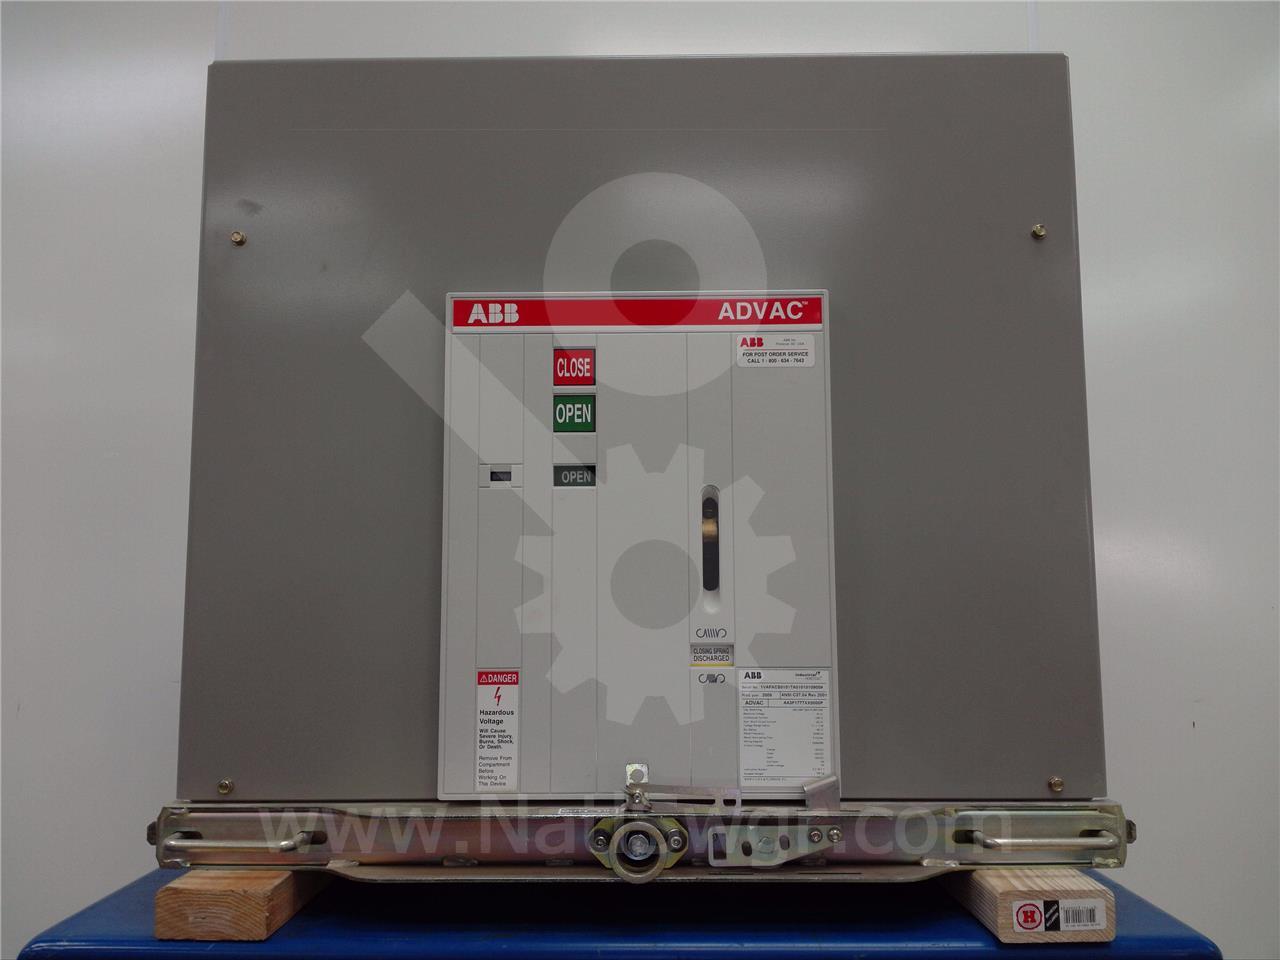 ABB / ITE / BBC 1200A ABB ADVAC AA3F1777XX0000P